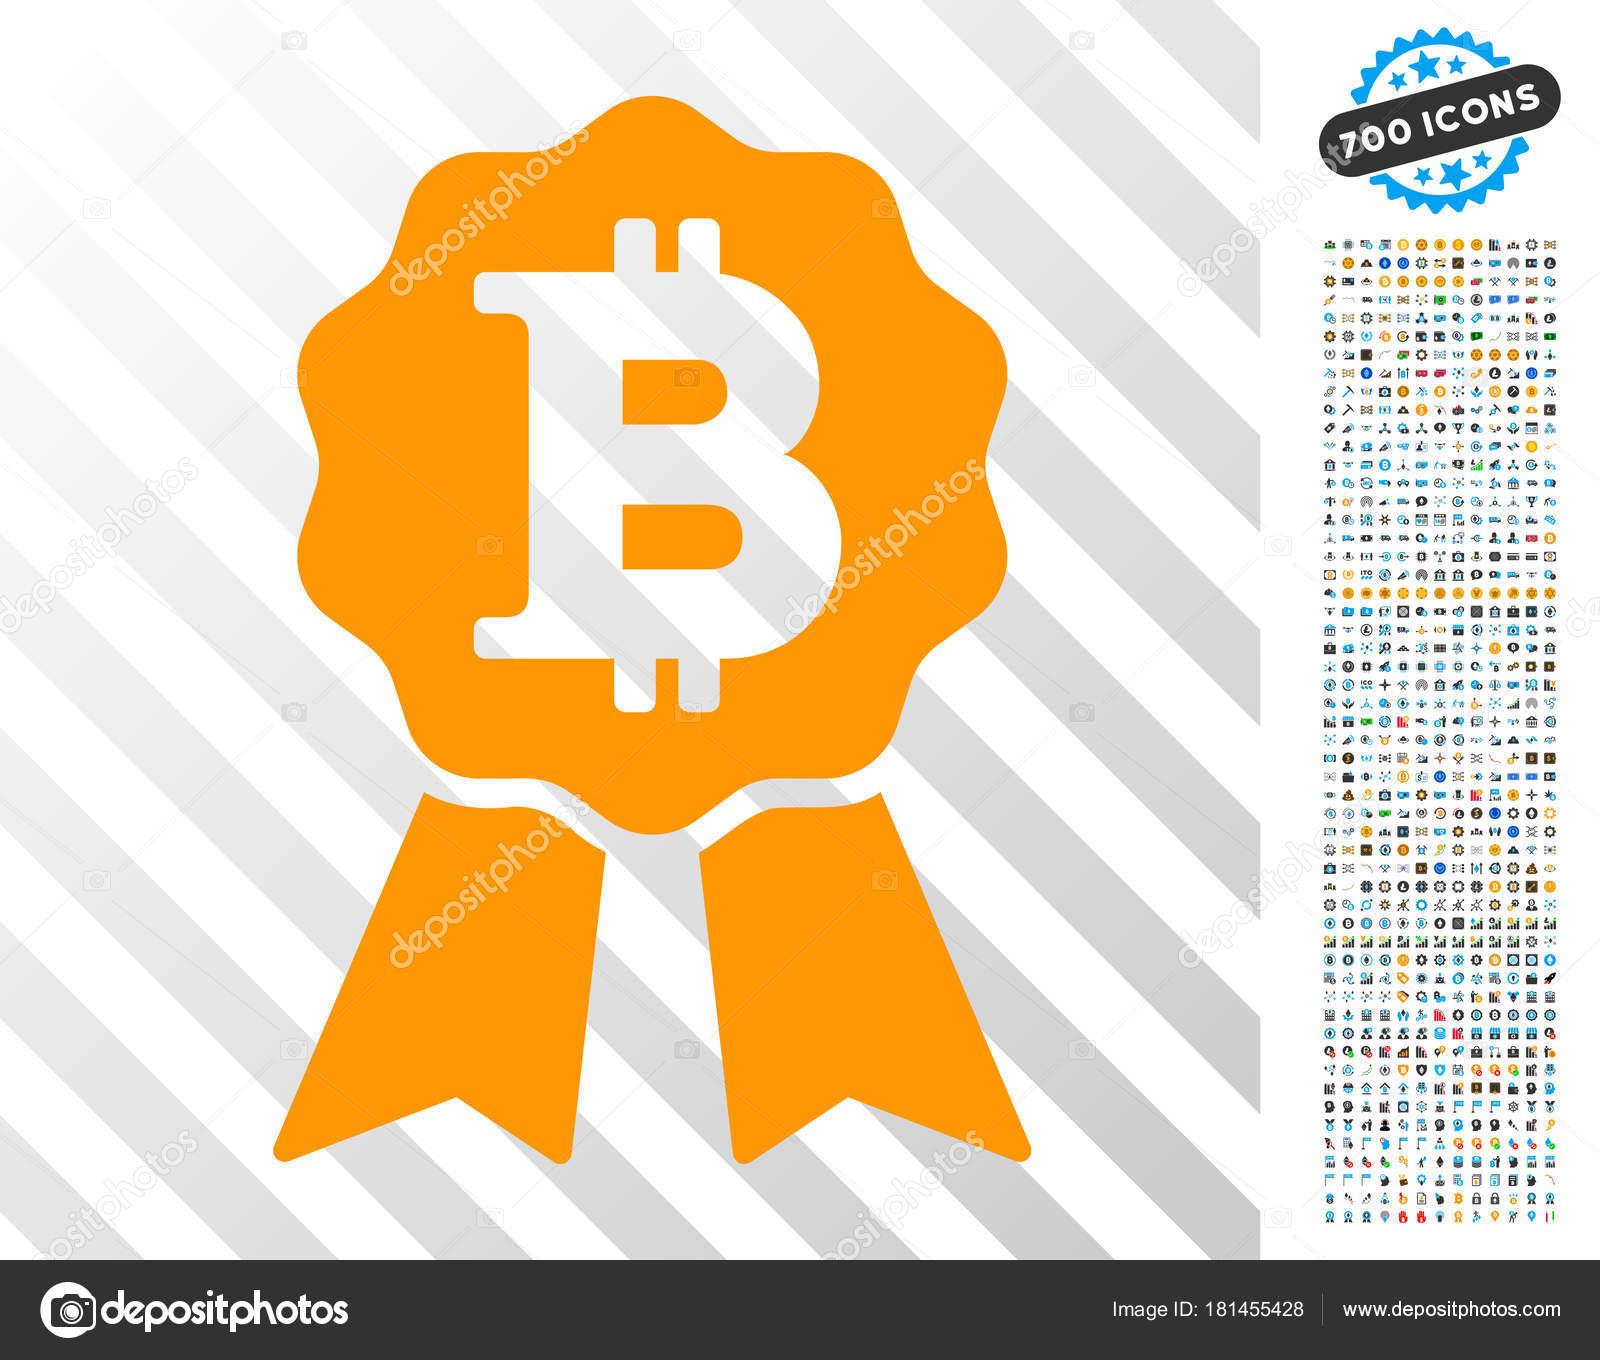 bitcoin tracker zertifikat beste bitcoins zu investieren rsi strategie binäre optionen